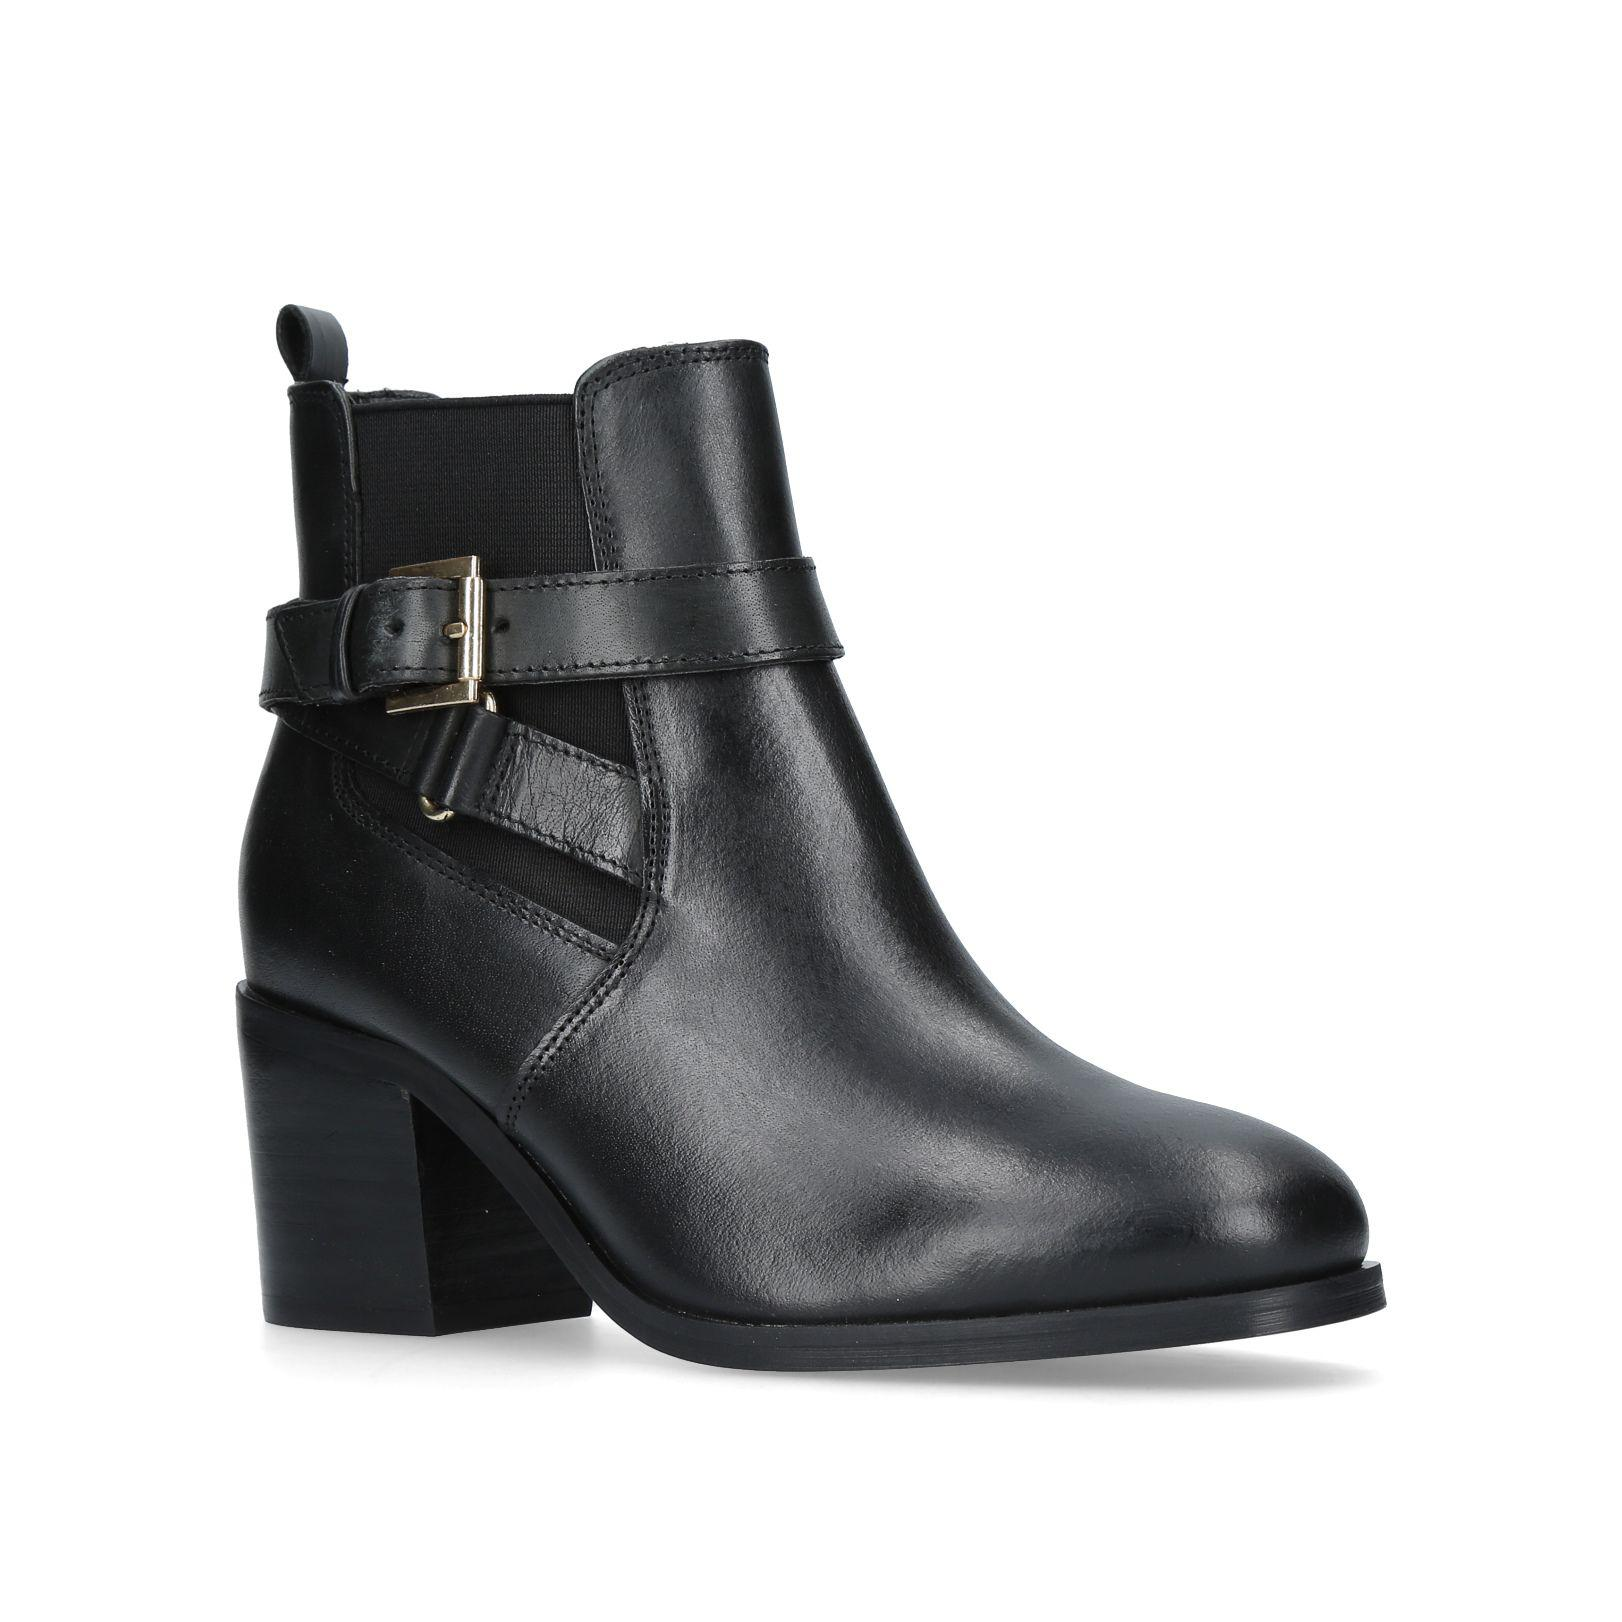 261a1c683bf821 Michael Kors Nancy Mid Pump Court Shoes in Black - Lyst